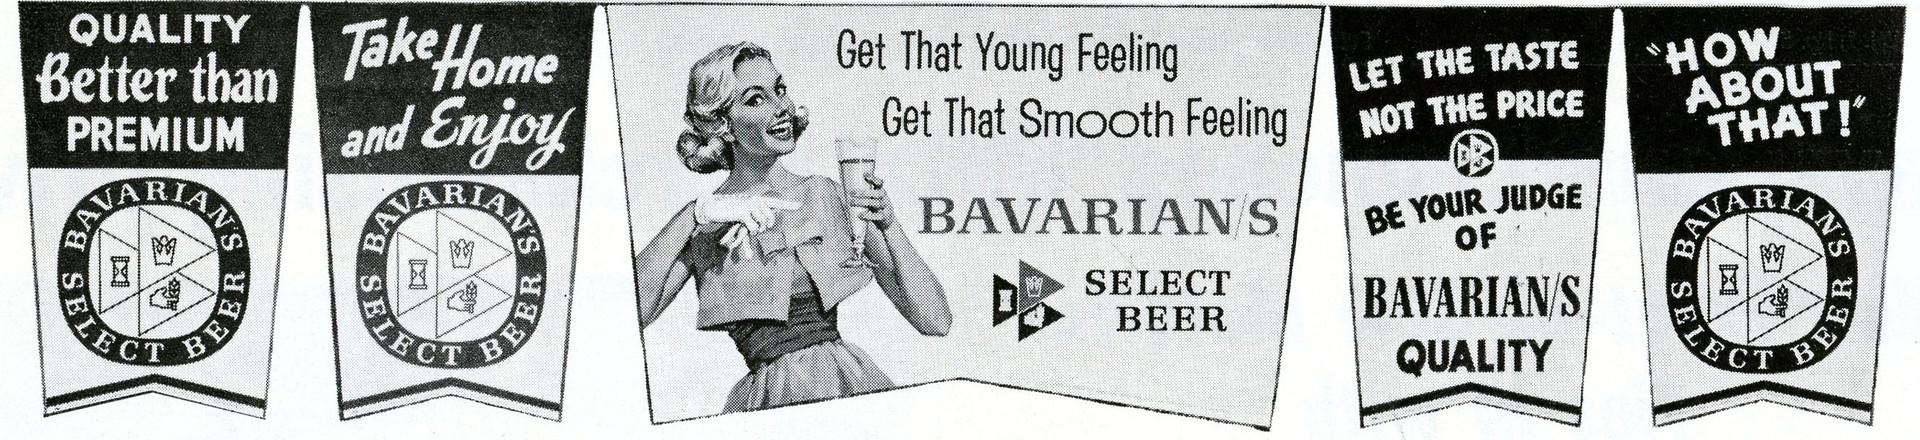 IBI Bavarian/s Select Beer Penants, 1959.